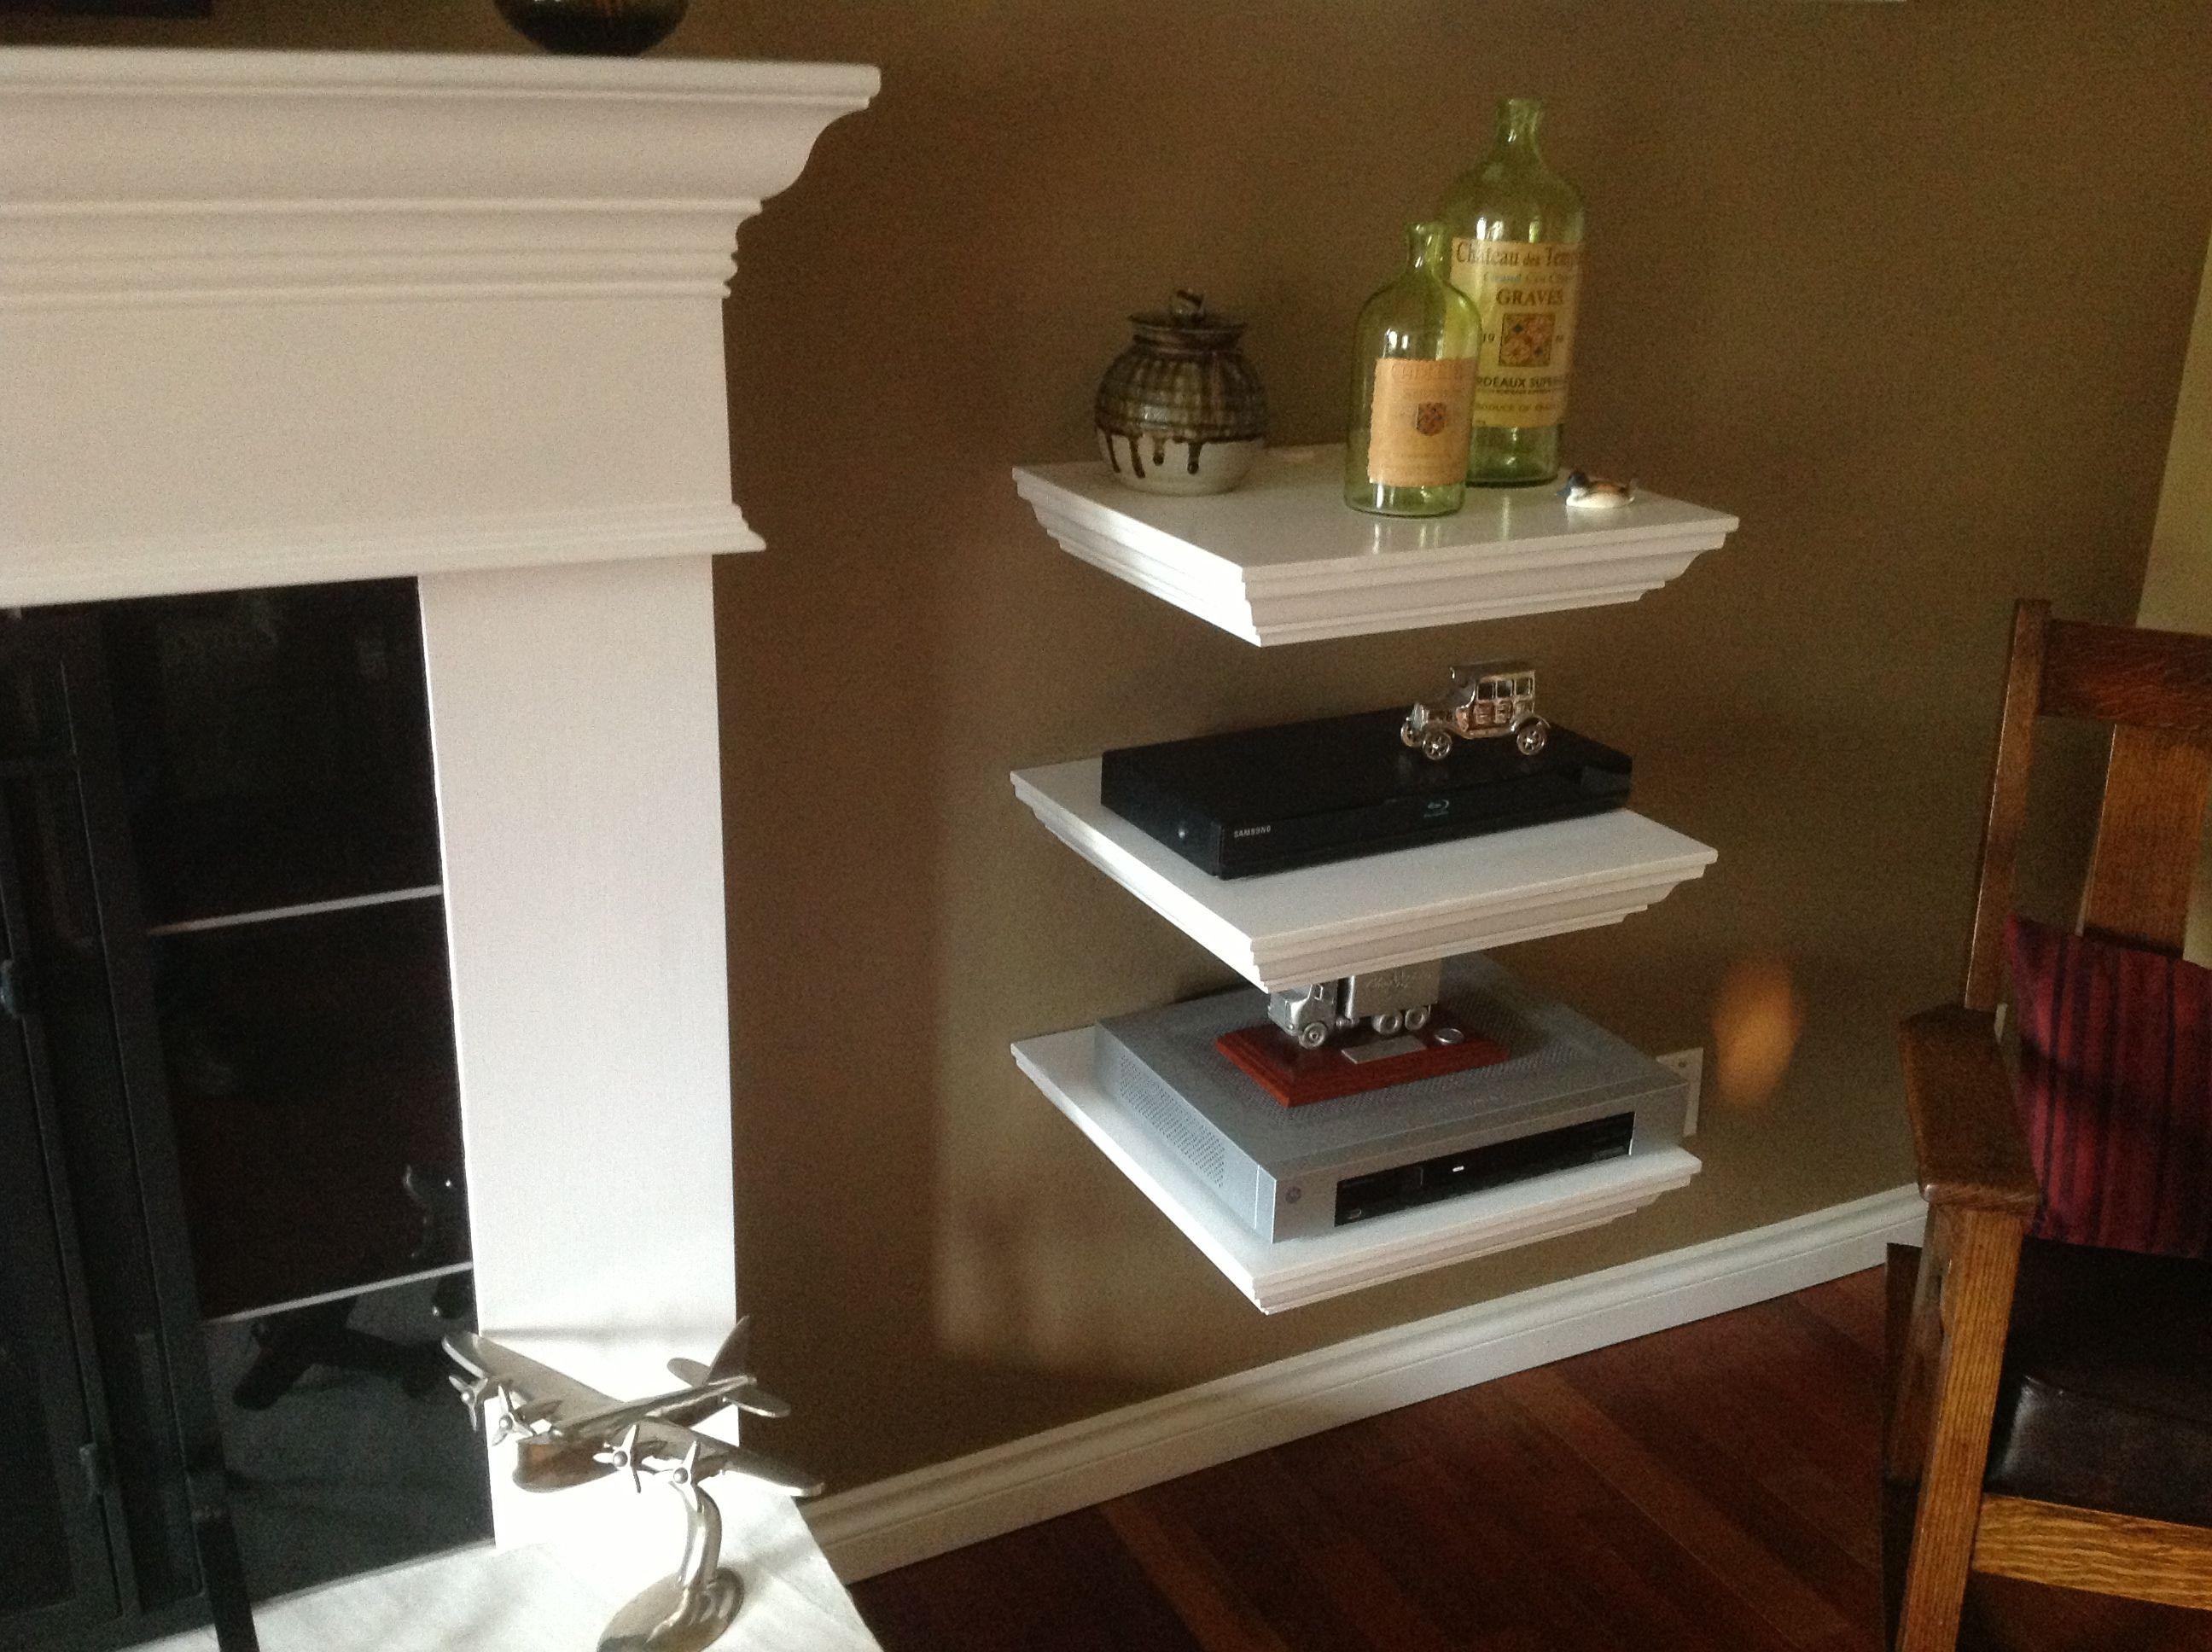 Home Entertainment Shelf System I Built All Cables Go Down Into